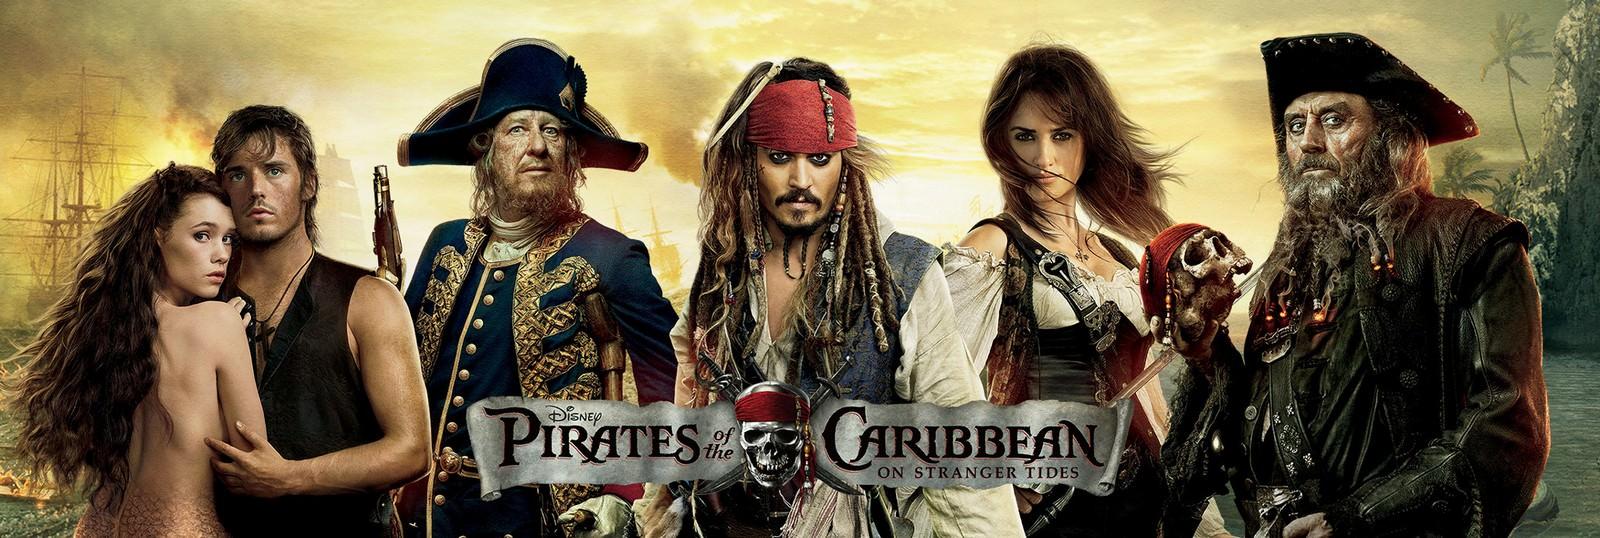 Movie, Pirates of the Caribbean: On Stranger Tides(美國, 2011年) / 加勒比海盜 神鬼奇航:幽靈海(台灣) / 加勒比海盗4:惊涛怪浪(中國) / 加勒比海盜:魔盜狂潮(香港), 電影海報, 美國, 橫版